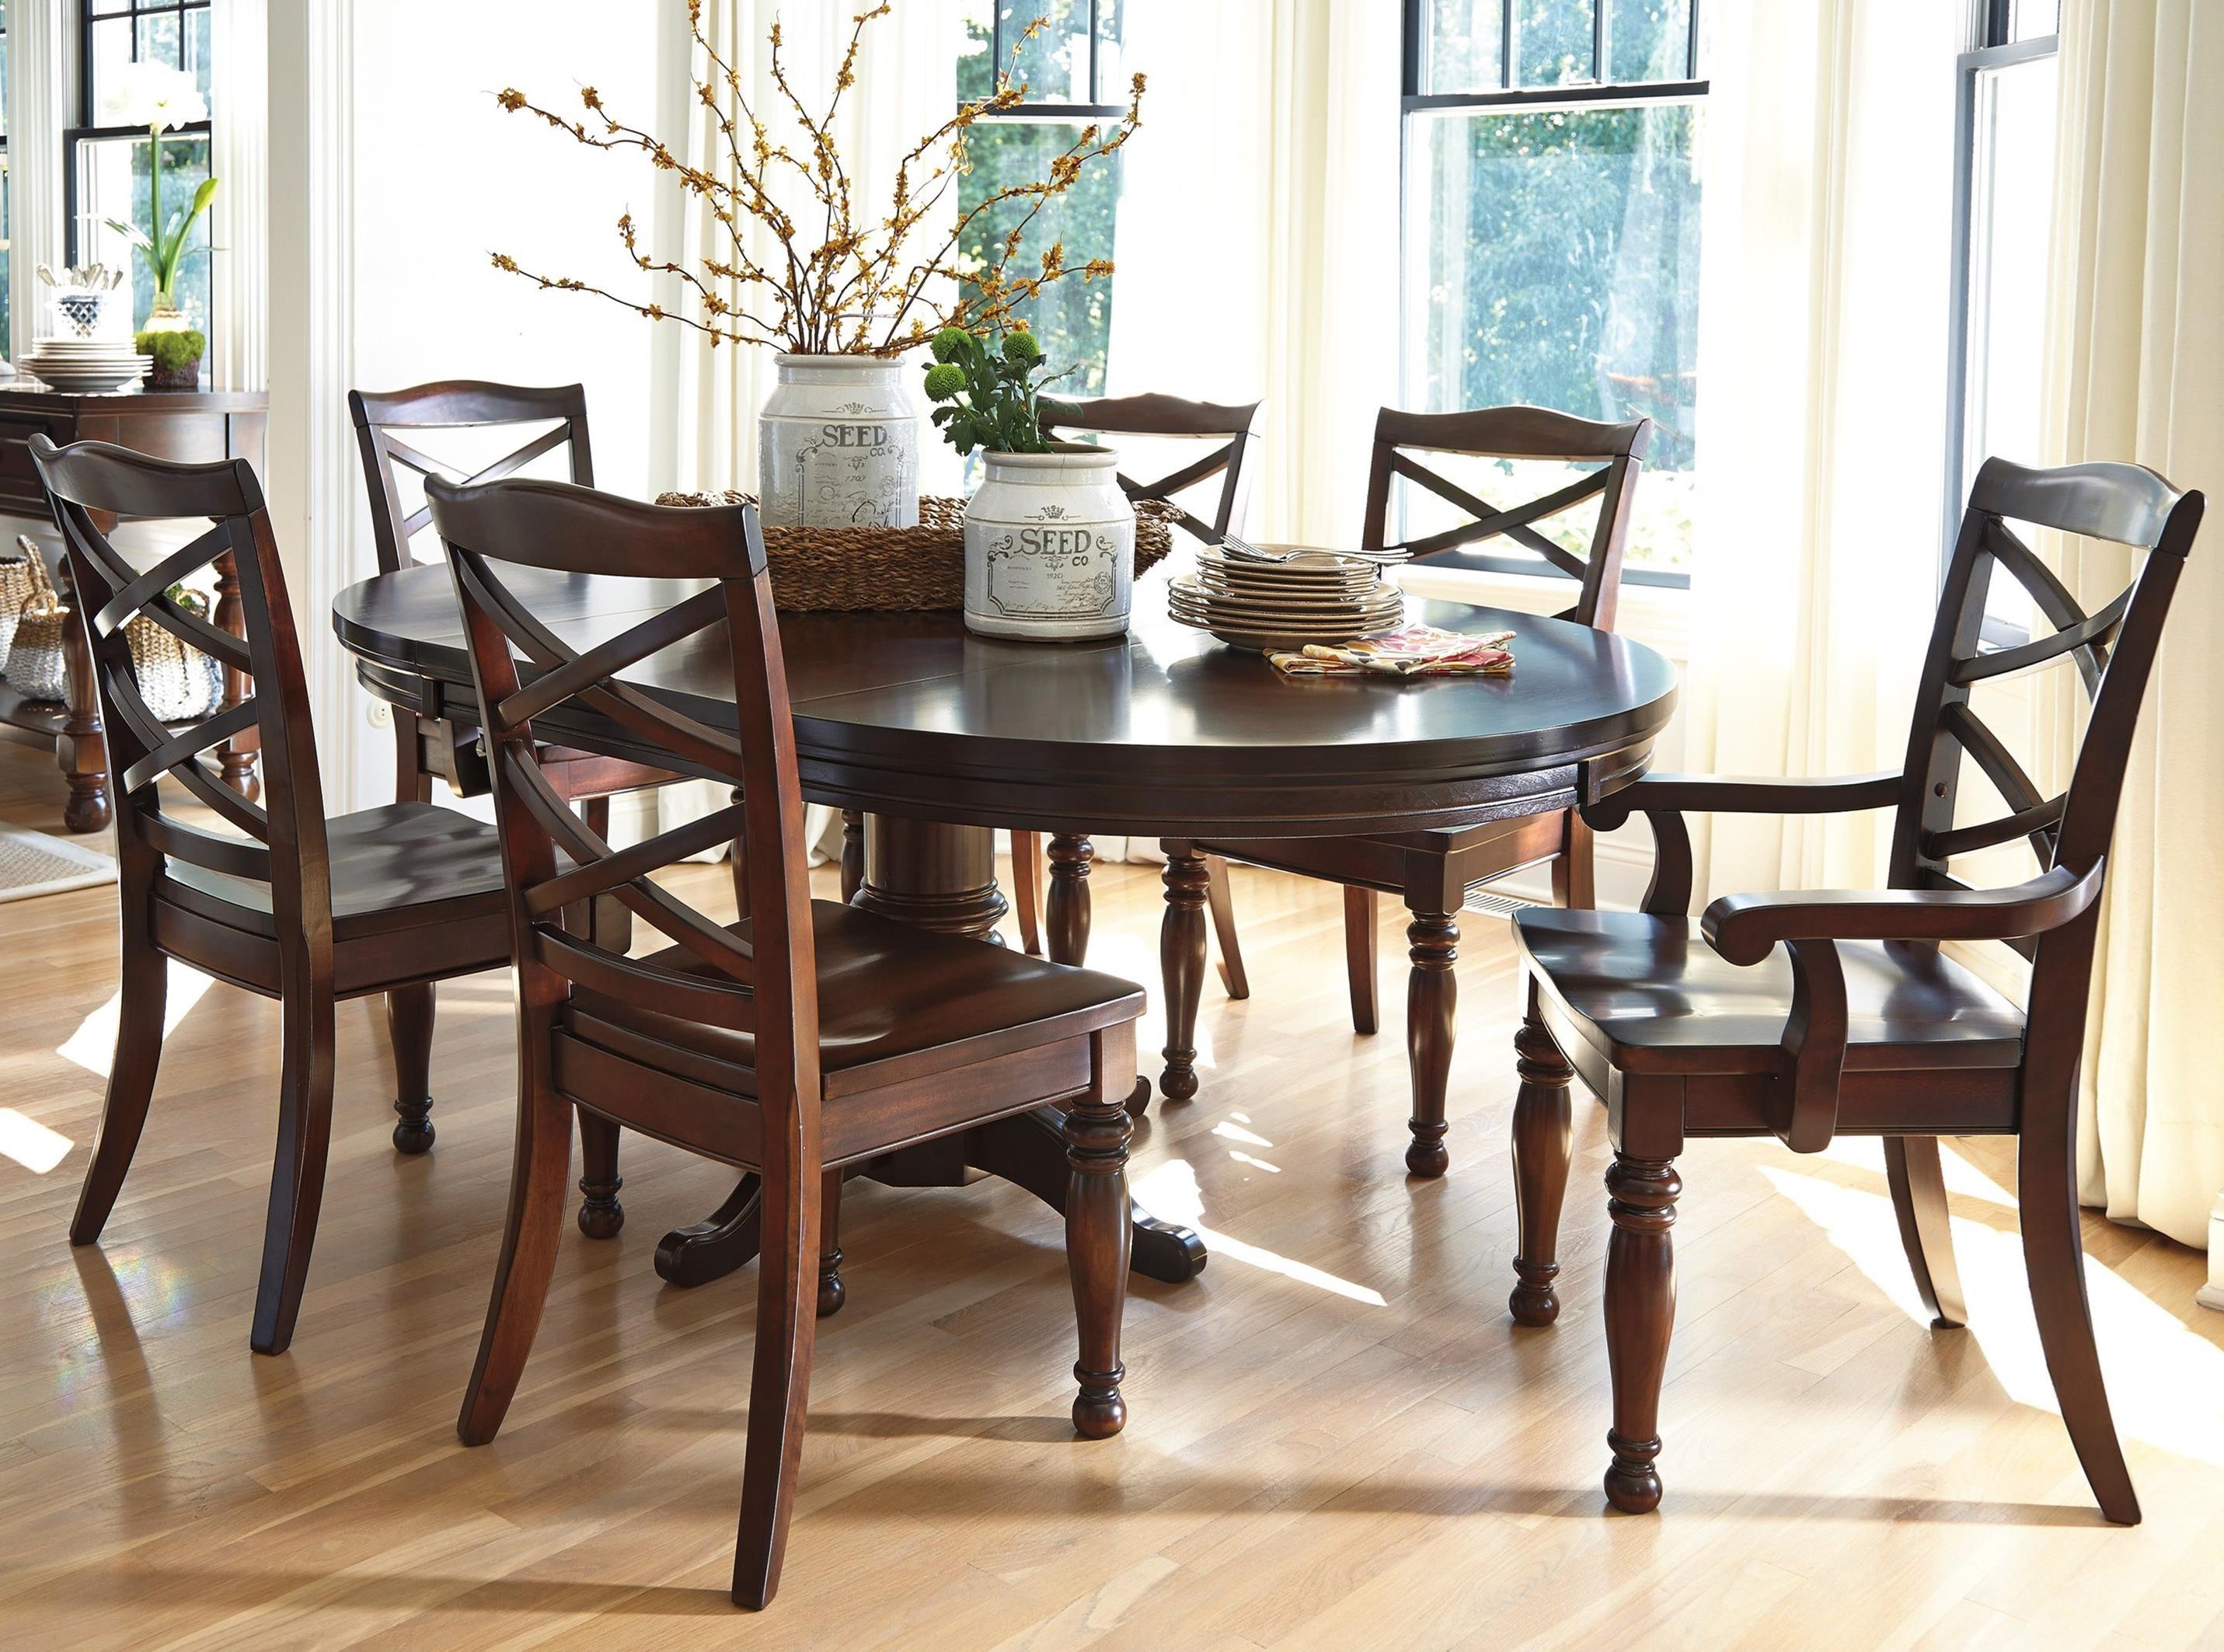 Ashley furniture porter 7 piece round dining table set for Ashley furniture dining table